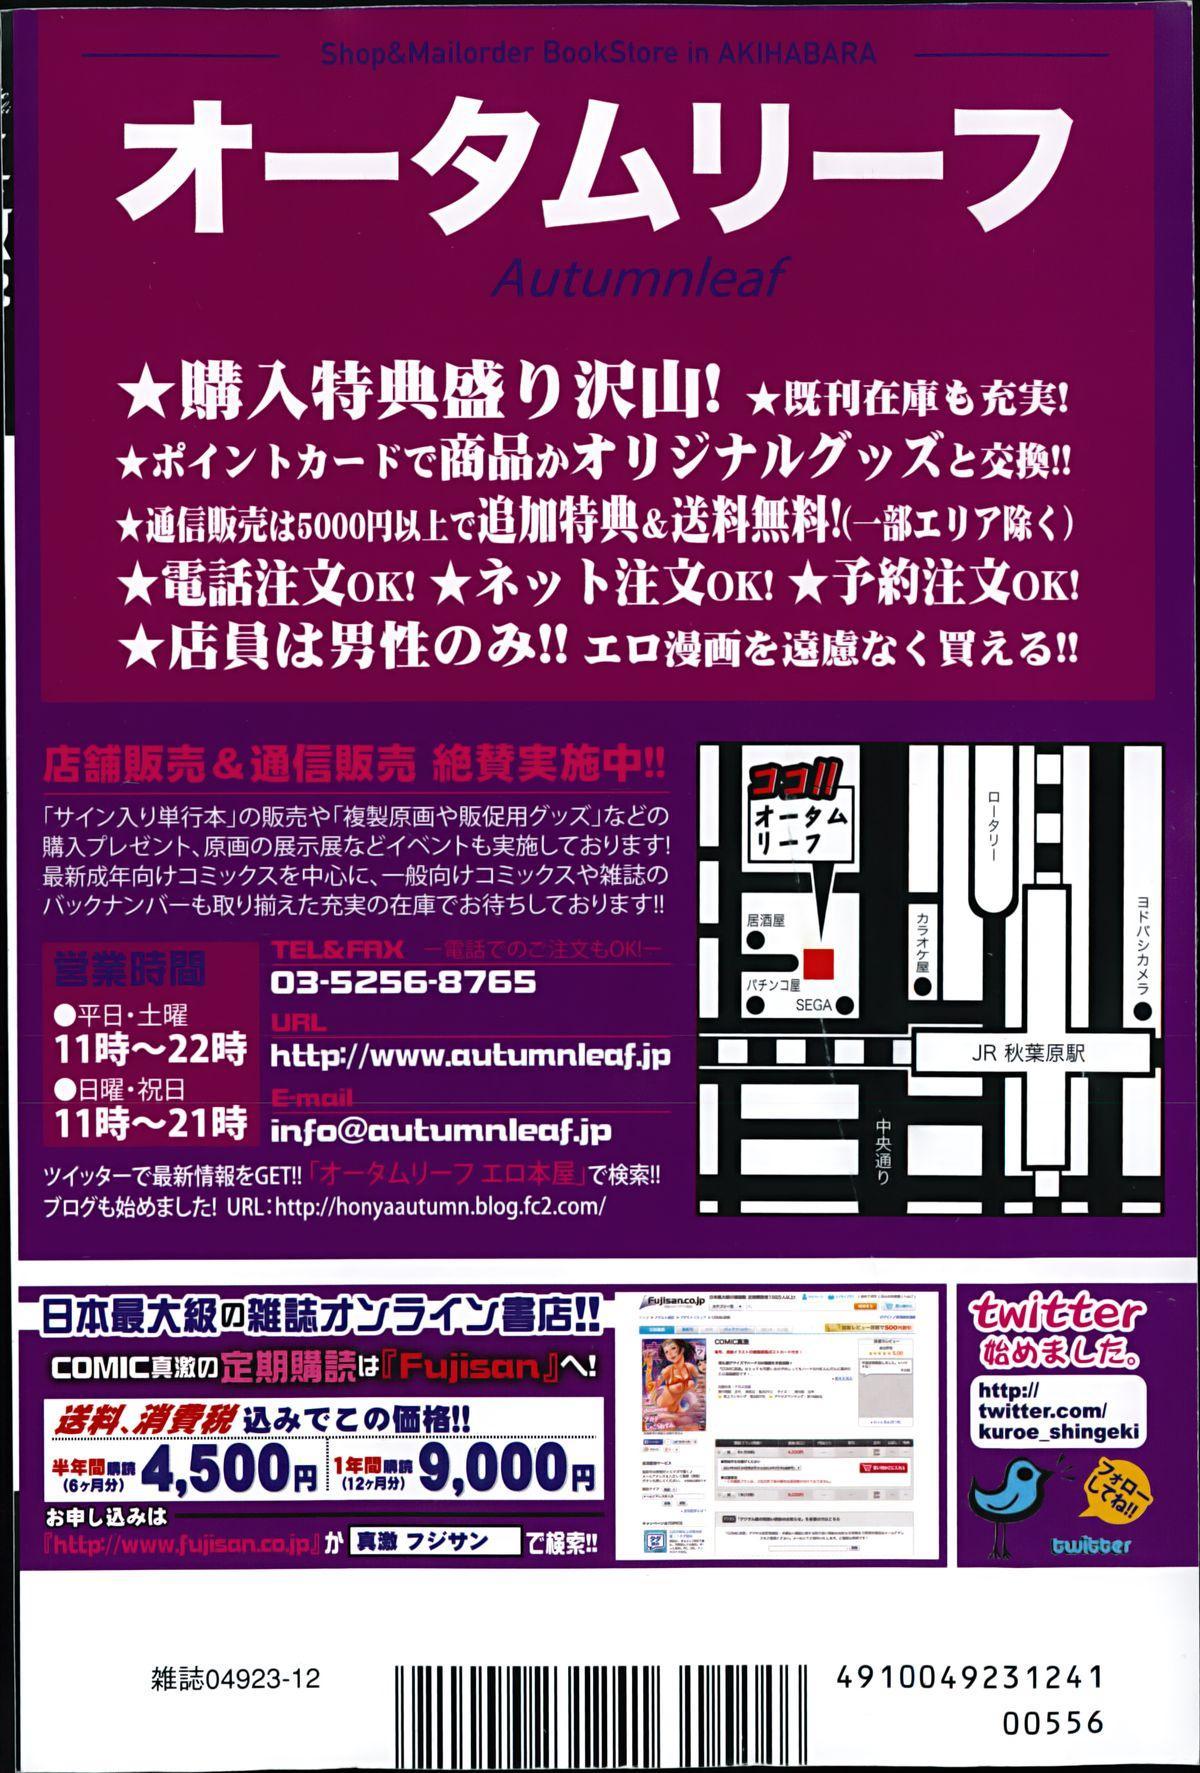 COMIC Shingeki 2014-12 359